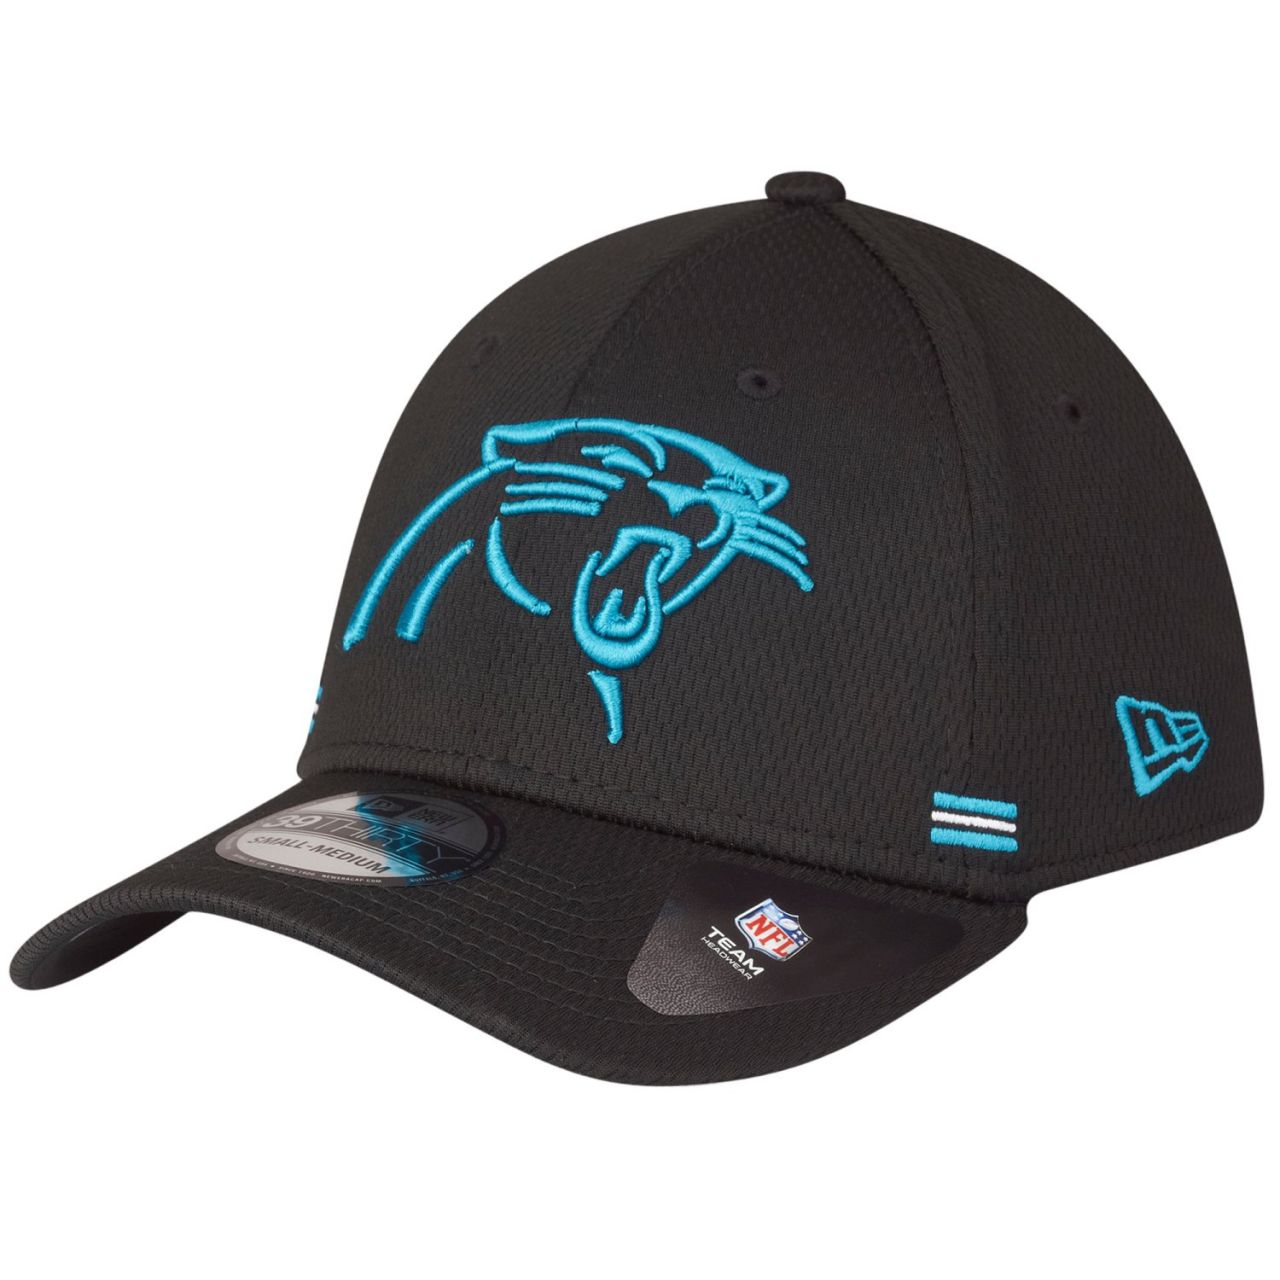 amfoo - New Era 39Thirty Cap - HOMETOWN Carolina Panthers